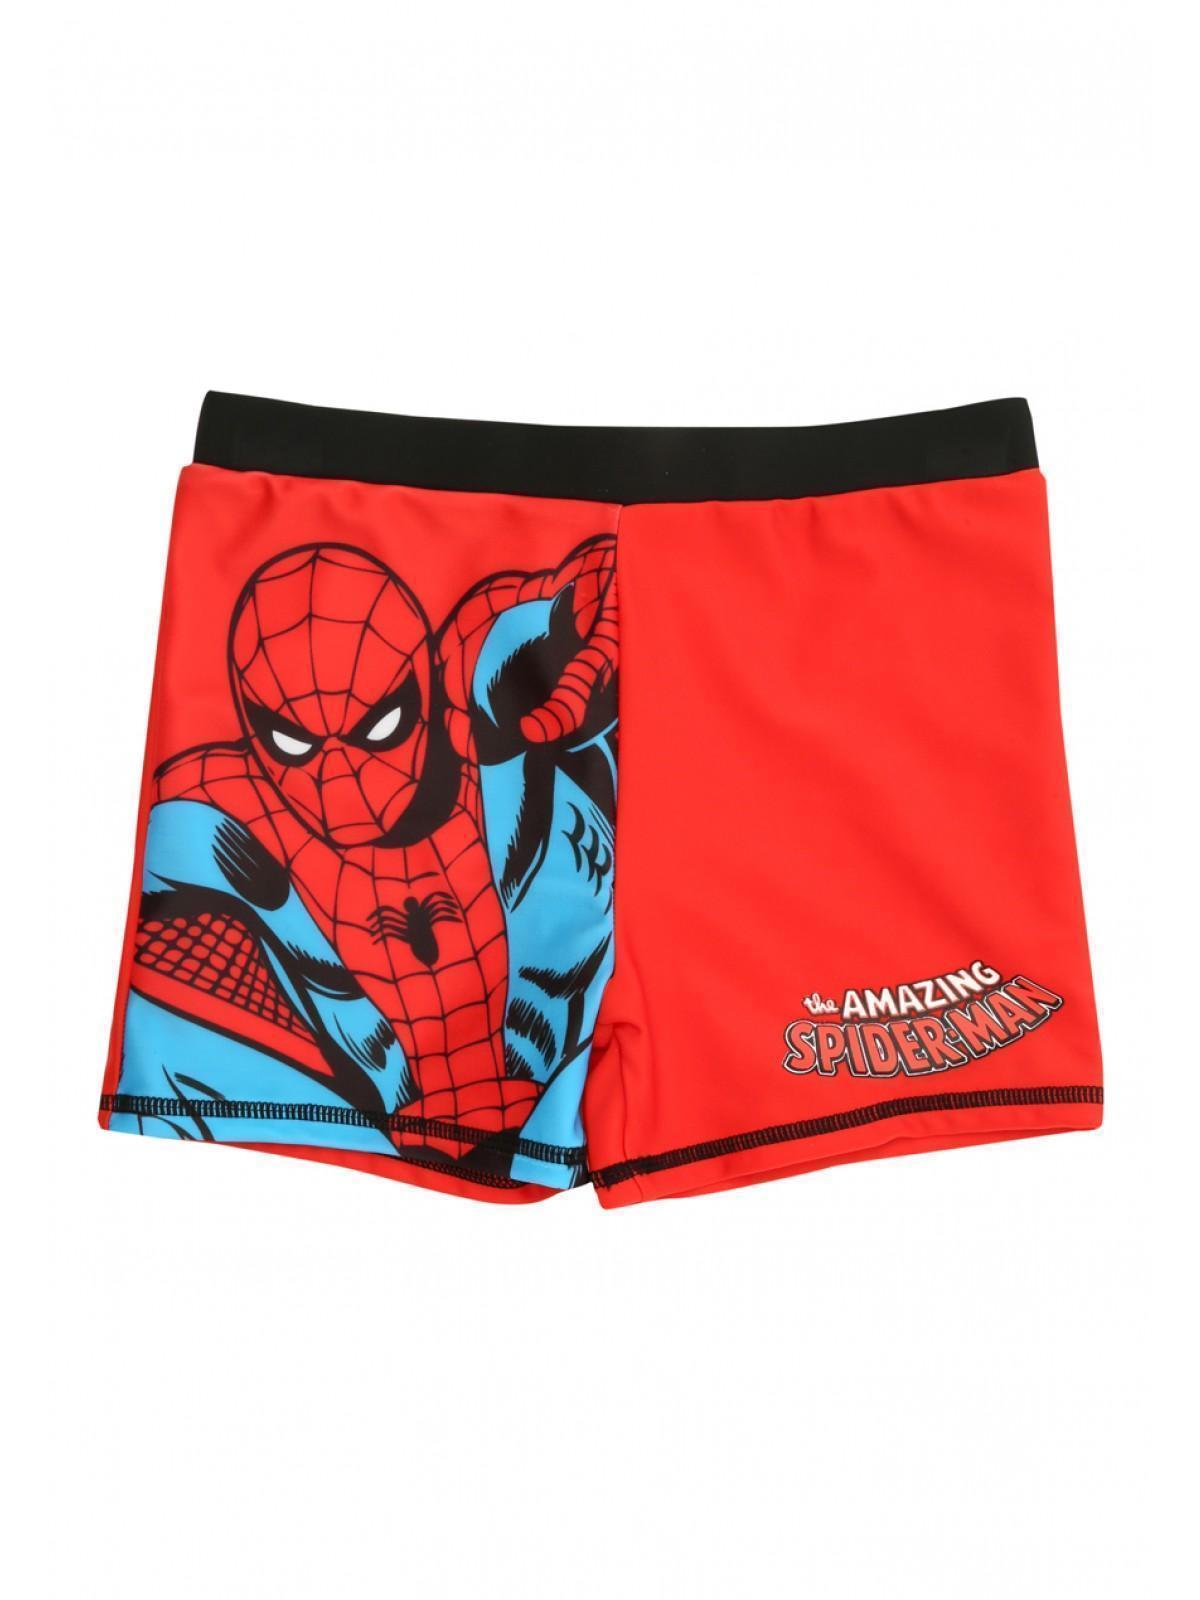 25efb08b0836c Home; Toddler Boys Spiderman Swimming Trunks. Back. PreviousNext